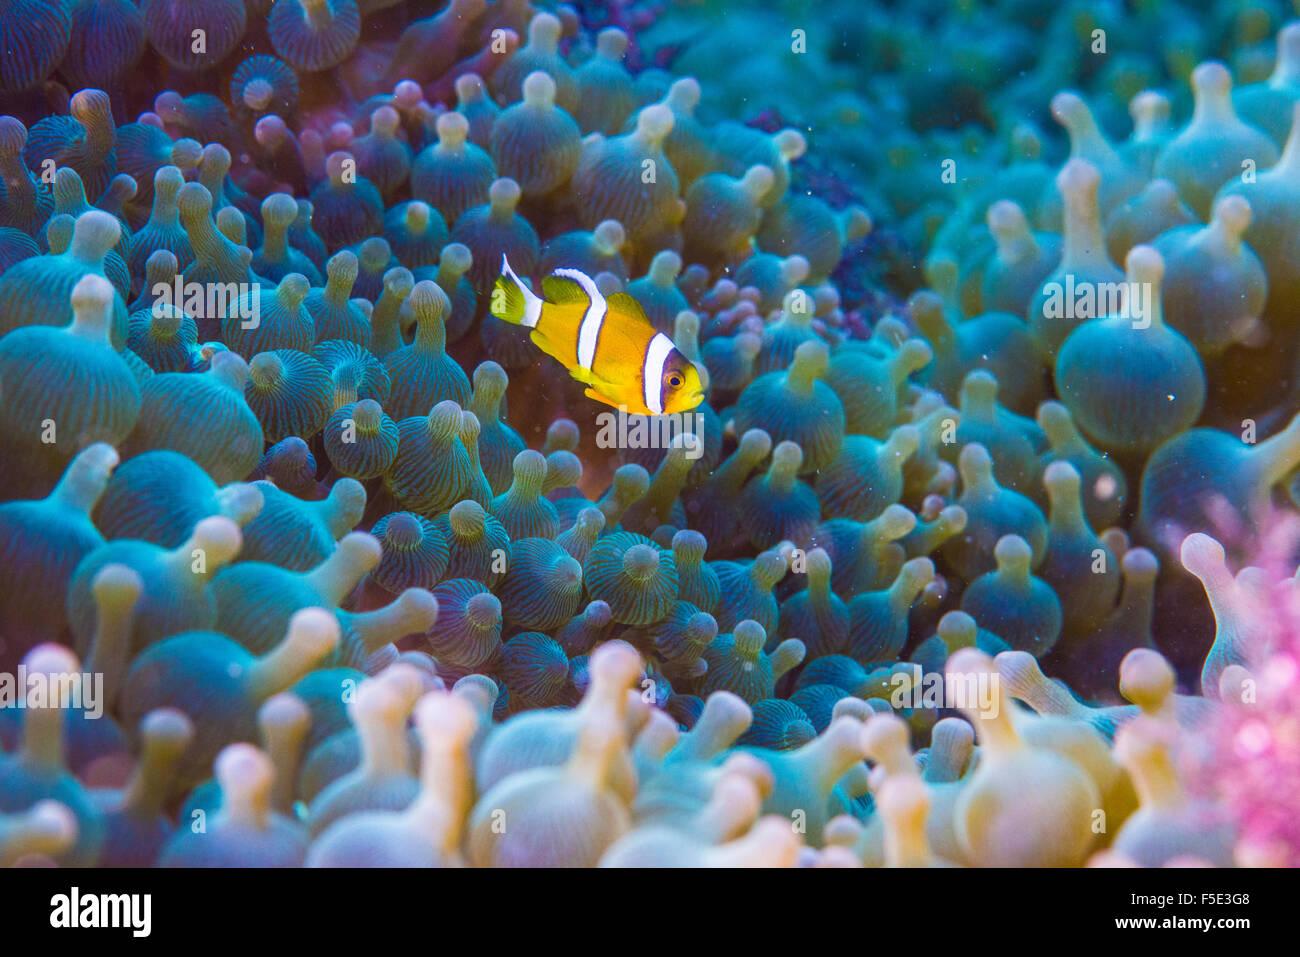 Kids anemone fish anemone fish, 1cm long, swimming around his big sea anemone house. at Kajika Owase Mie Japan - Stock Image